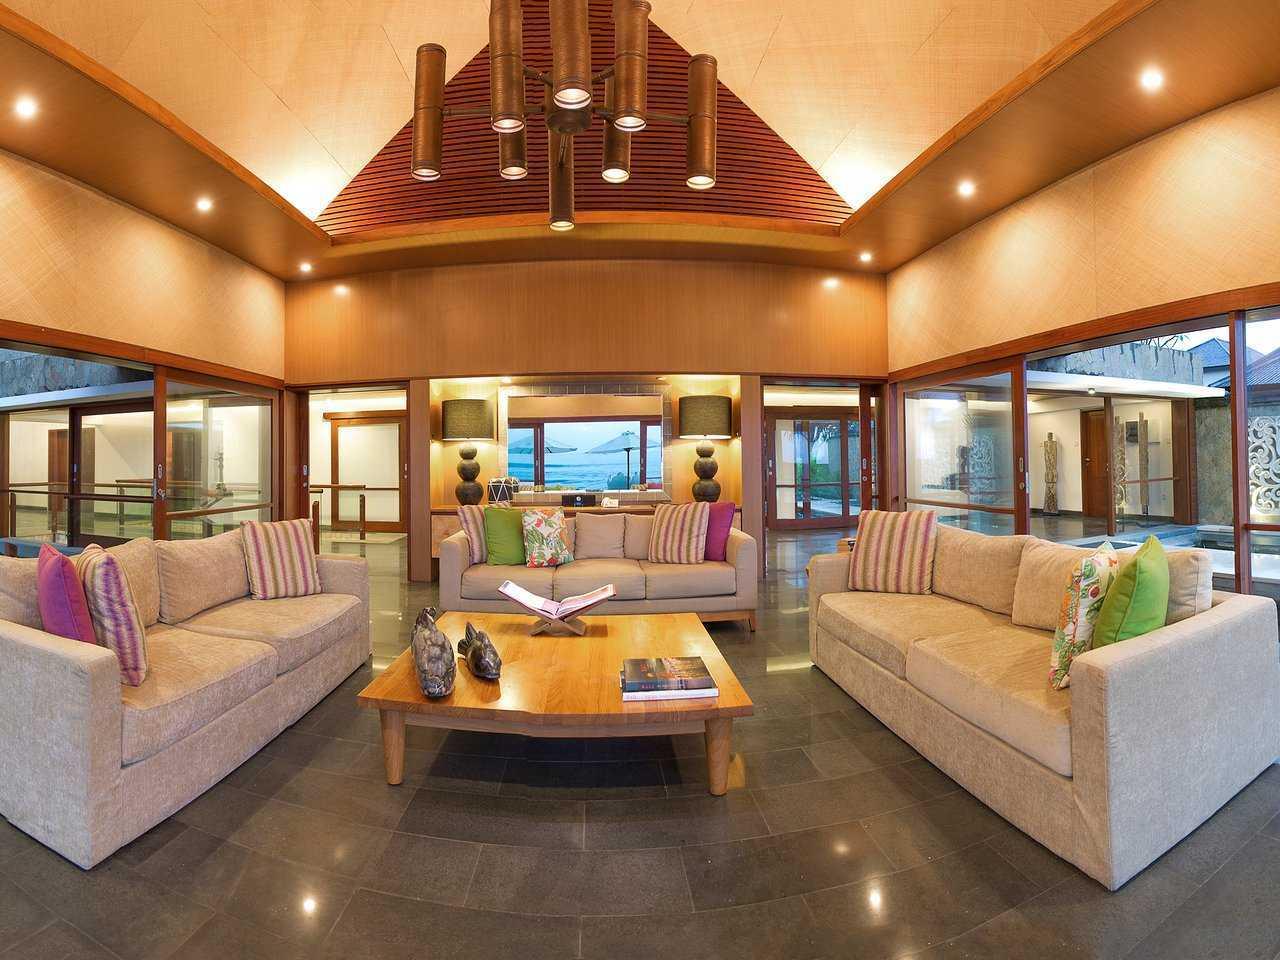 Agung Budi Raharsa | Architecture & Engineering Bayu Gita Villa - Bali Bali, Indonesia Bali, Indonesia Agung-Budi-Raharsa-Bayu-Gita-Villa-By-Agung-Budi-Raharsa-With-Csa Contemporary 88348